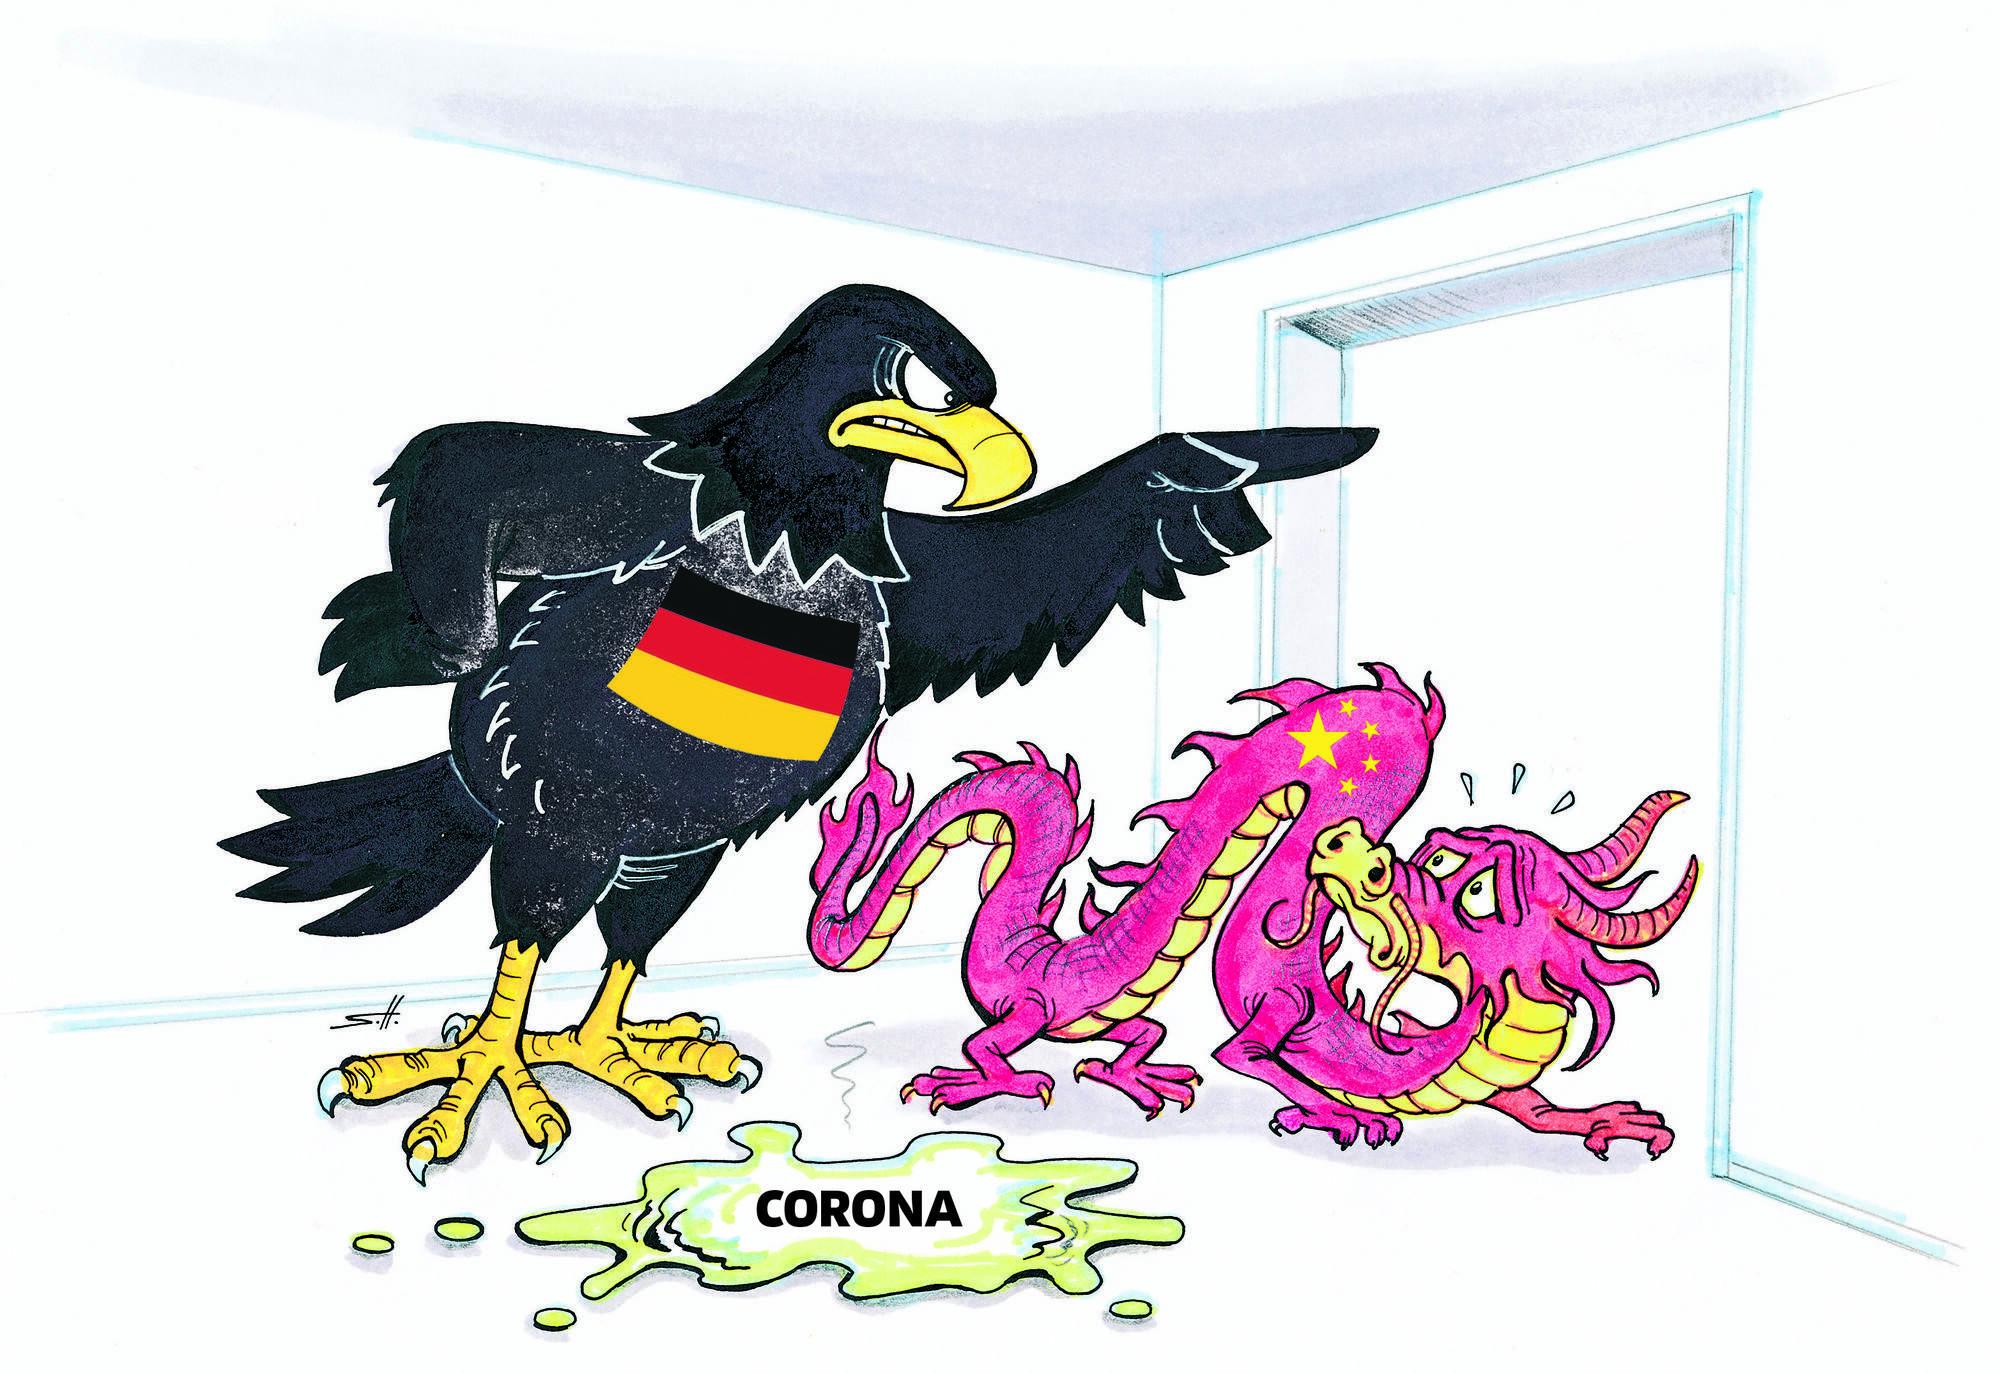 Coronavirus: Angst und Diskriminierung - Schwere Anfeindungen ...